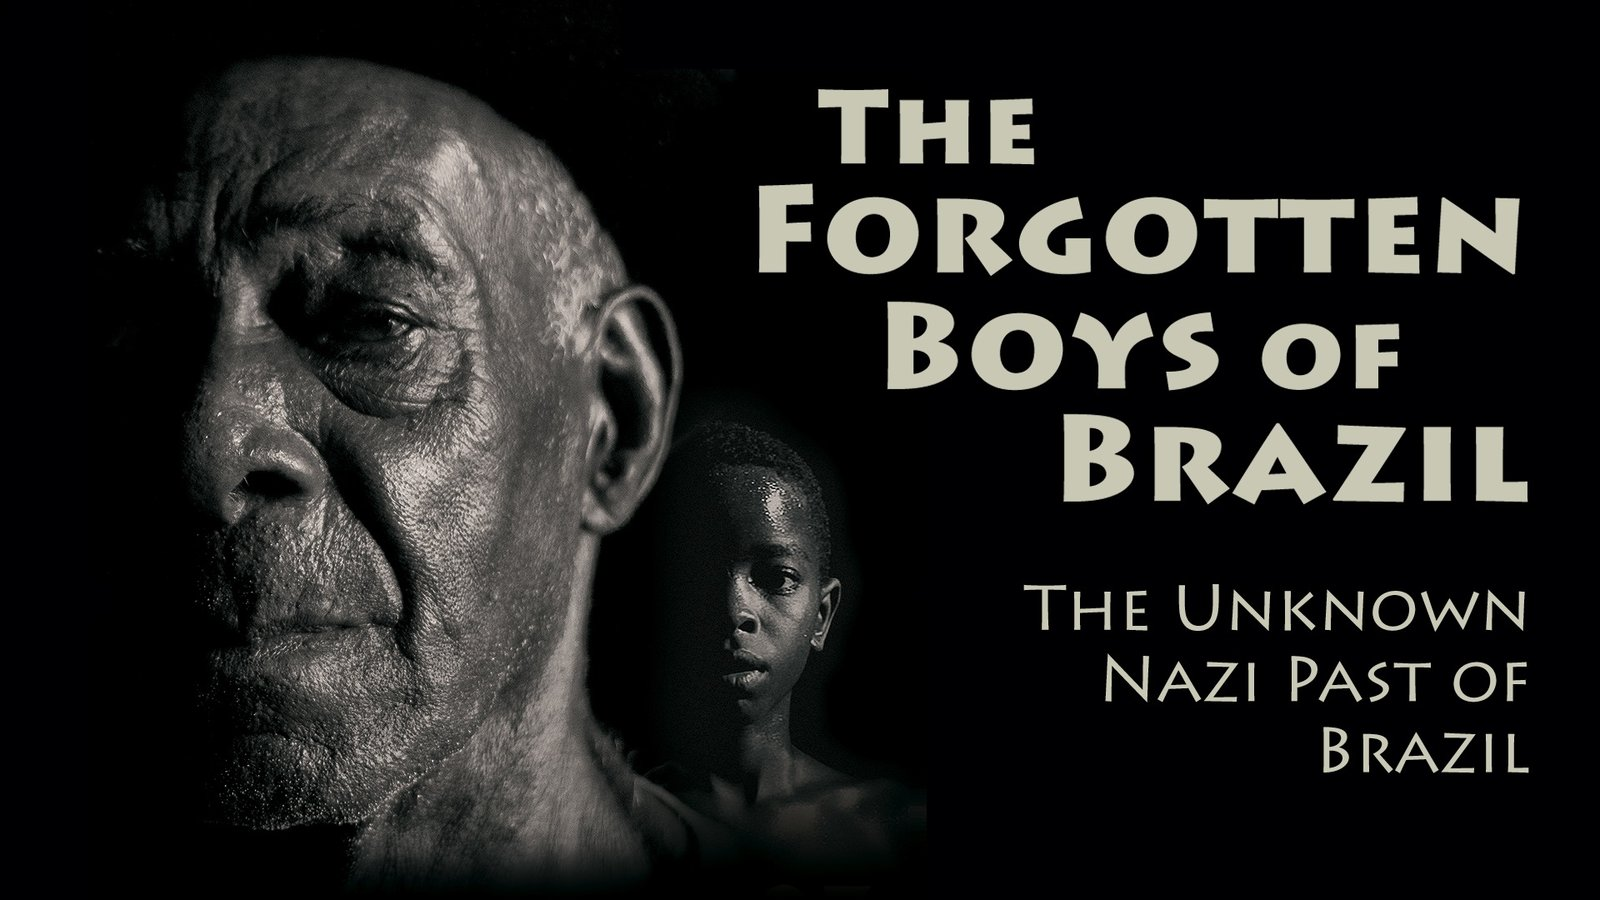 The Forgotten Boys of Brazil (Menino 23) - A History of Nazis in Brazil